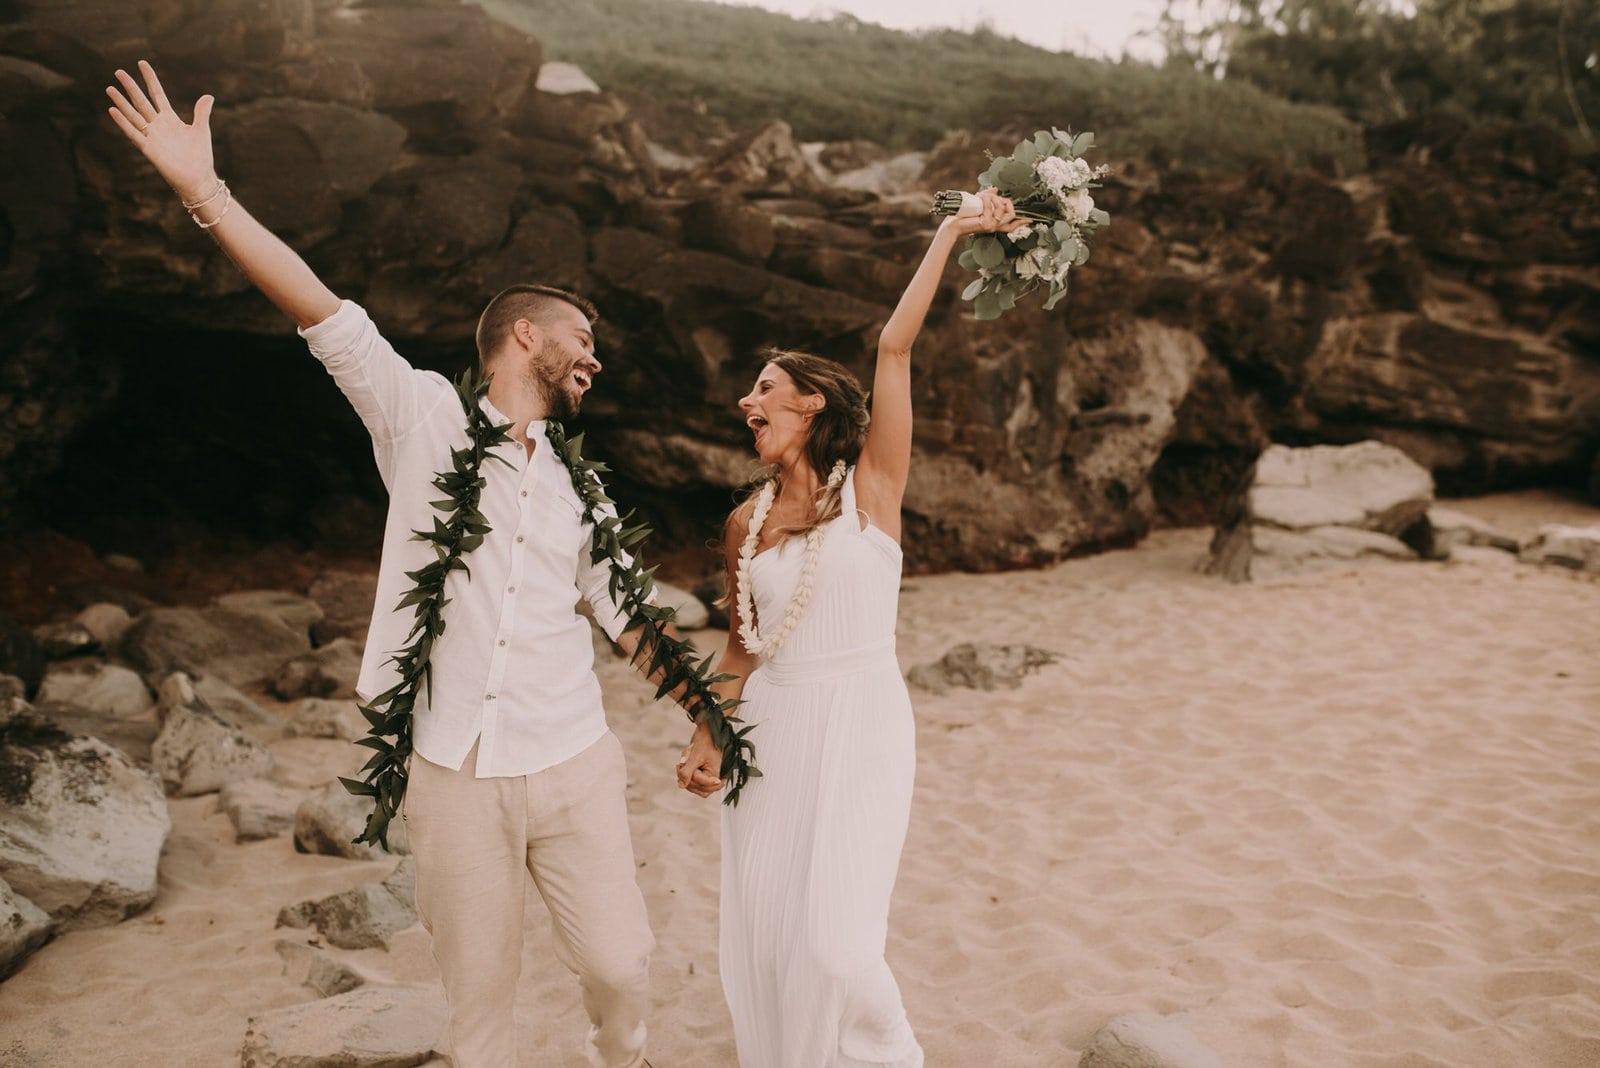 groom and bride celebrating